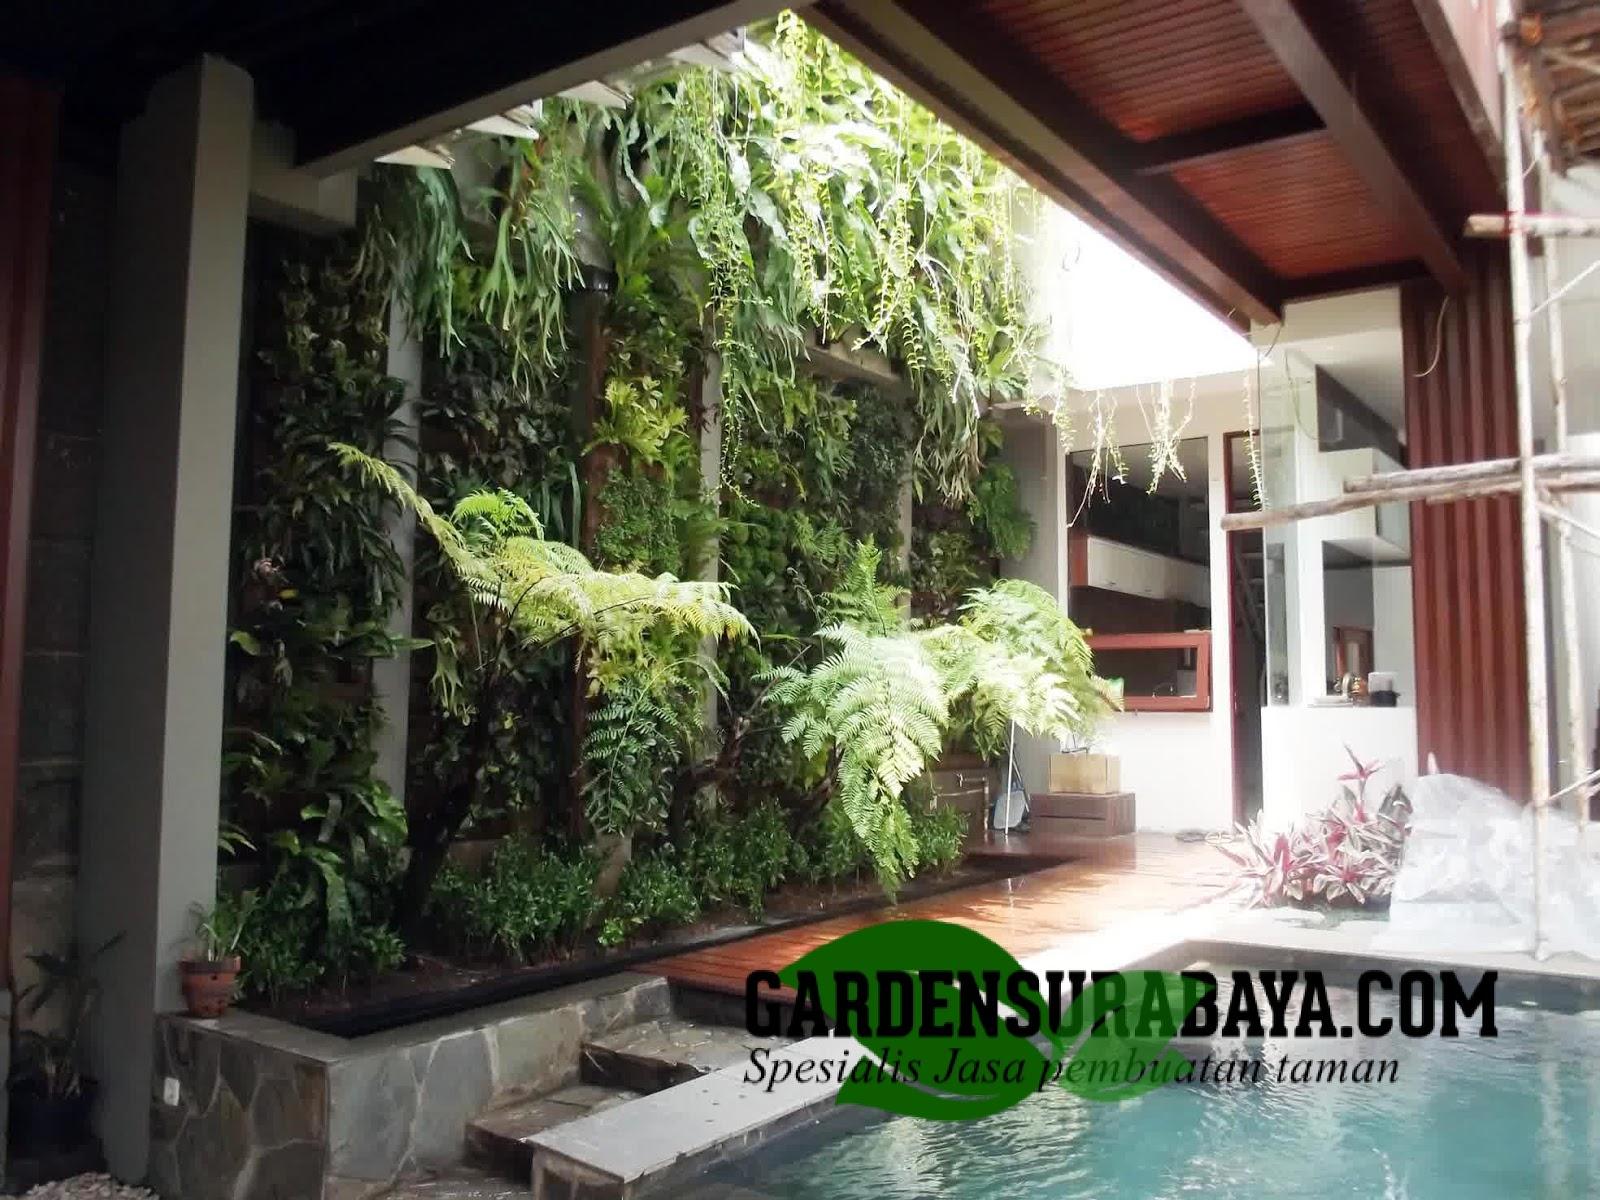 Contoh Gambar Desain Konsep Taman Vertikal Surabaya Garden Surabaya